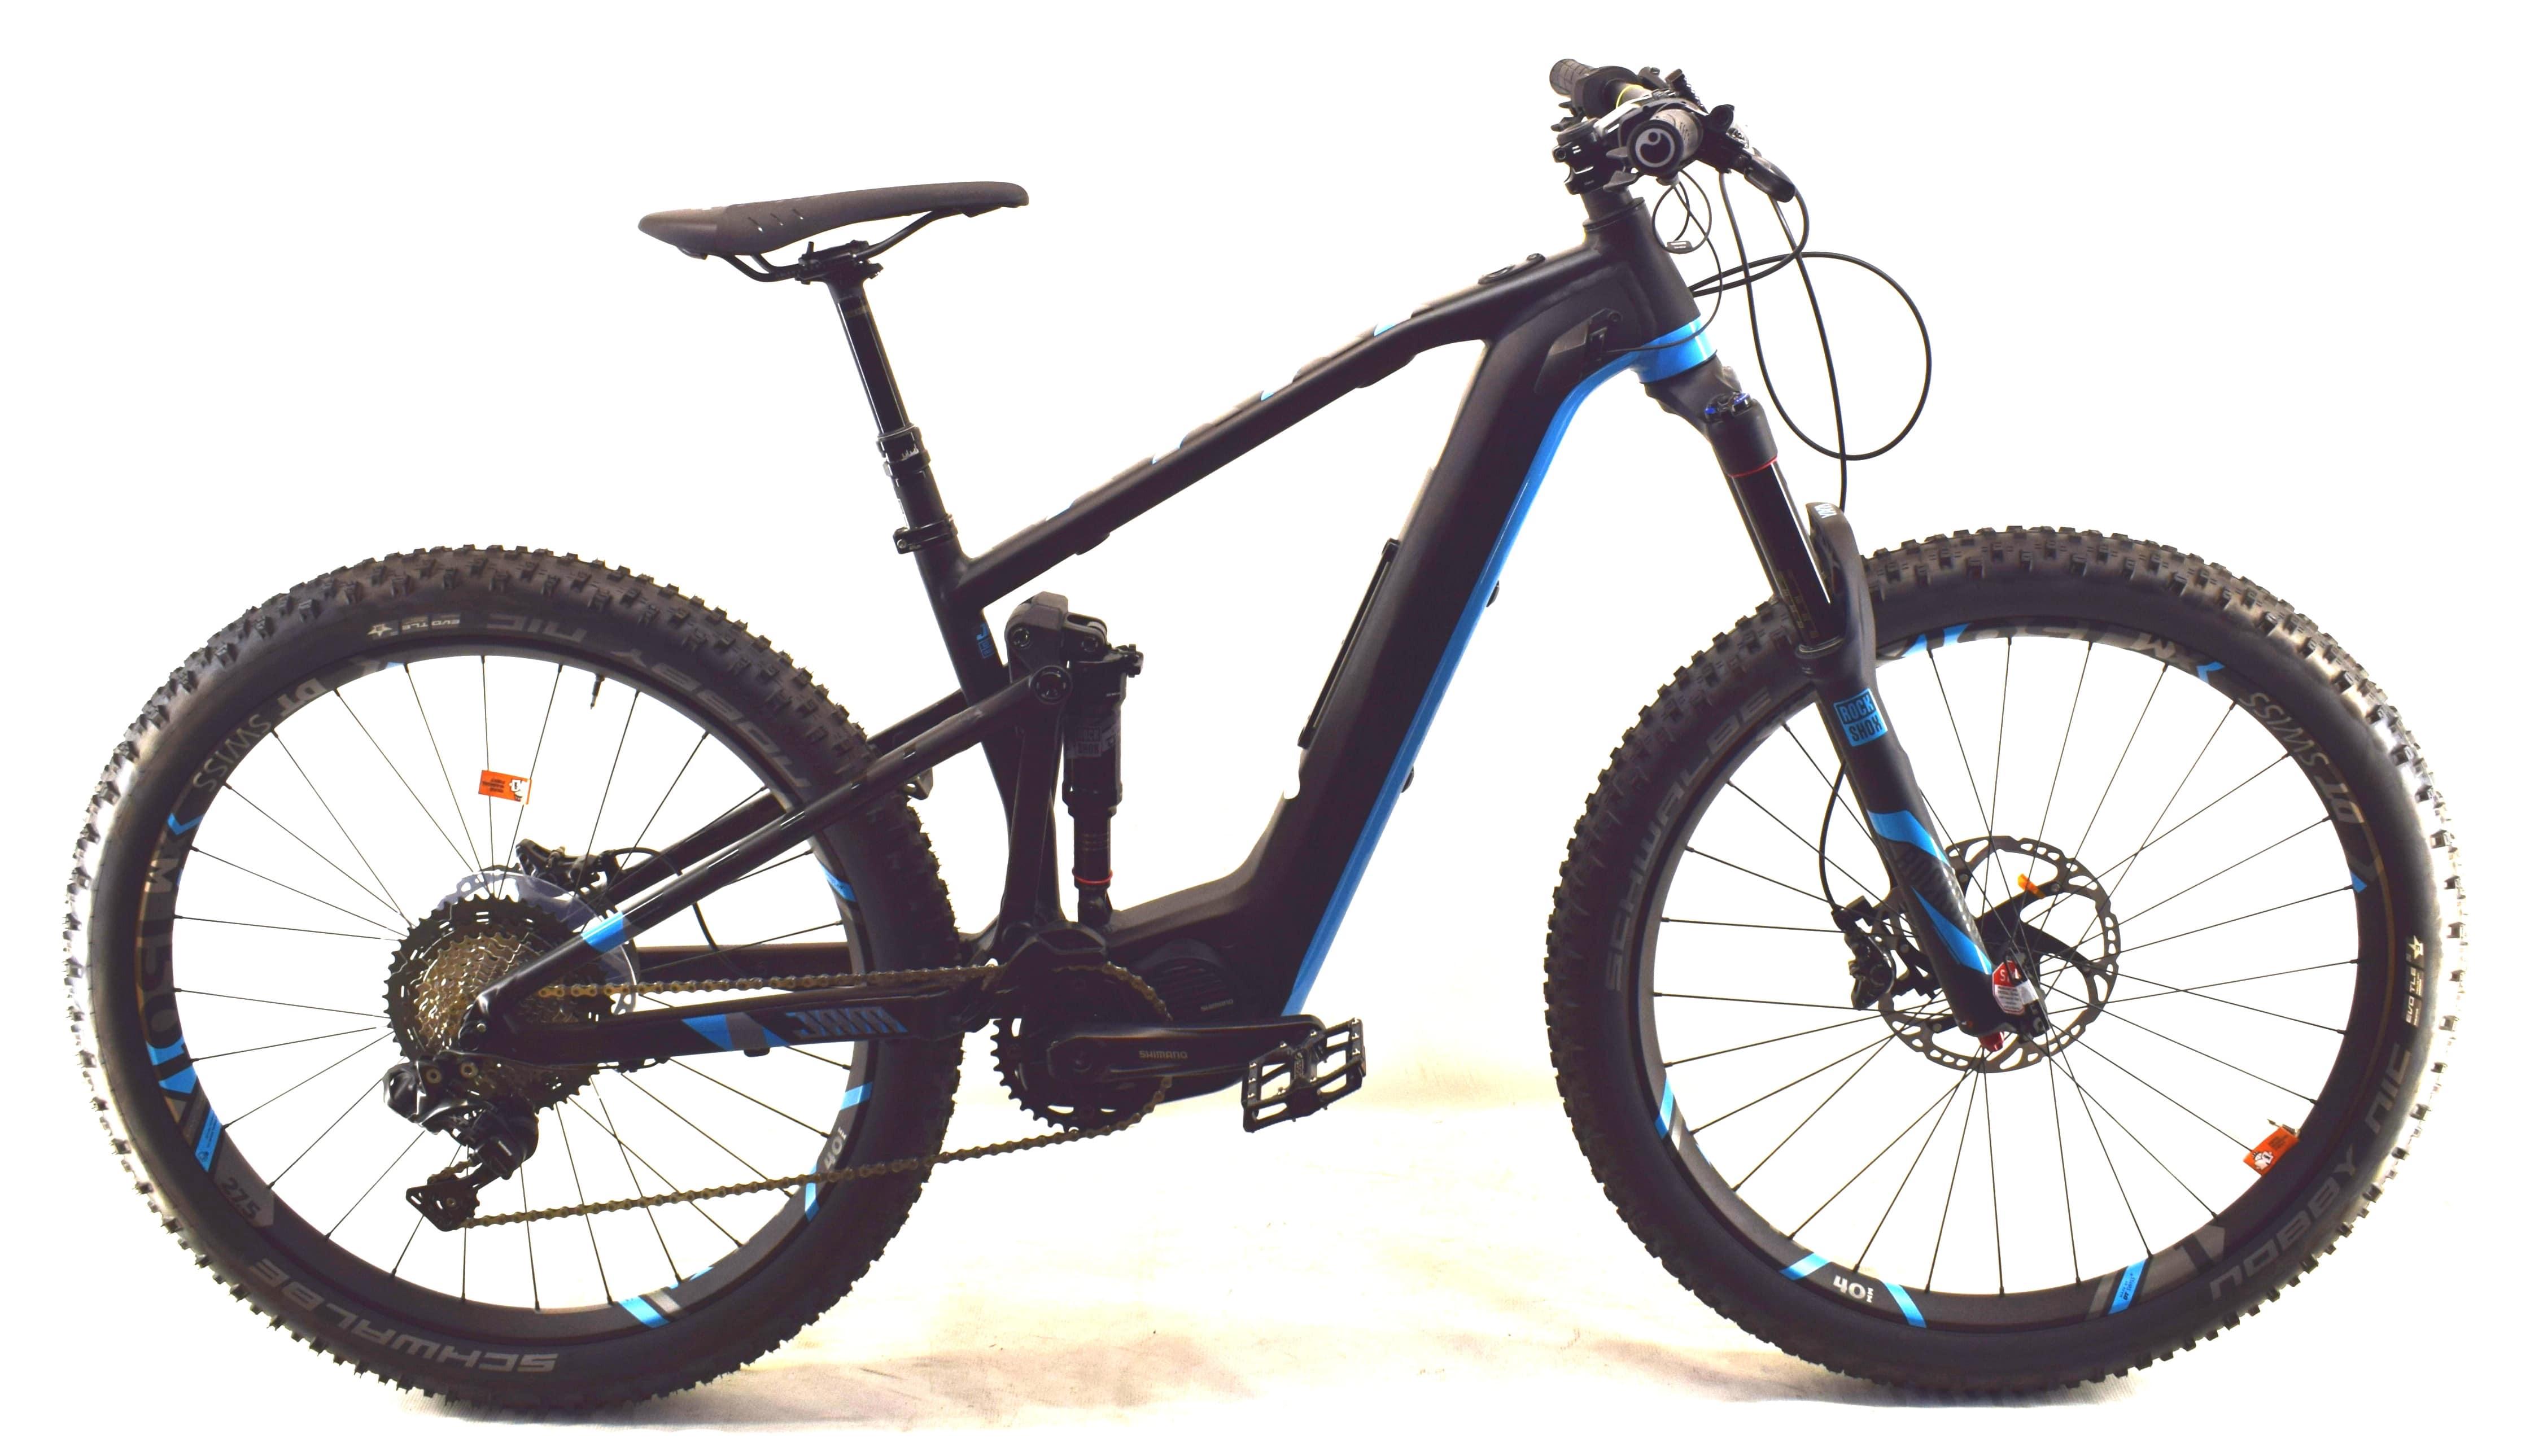 Focus Jam² Plus Pro E-MTB, Fully, E-Mountainbike, Trailbike